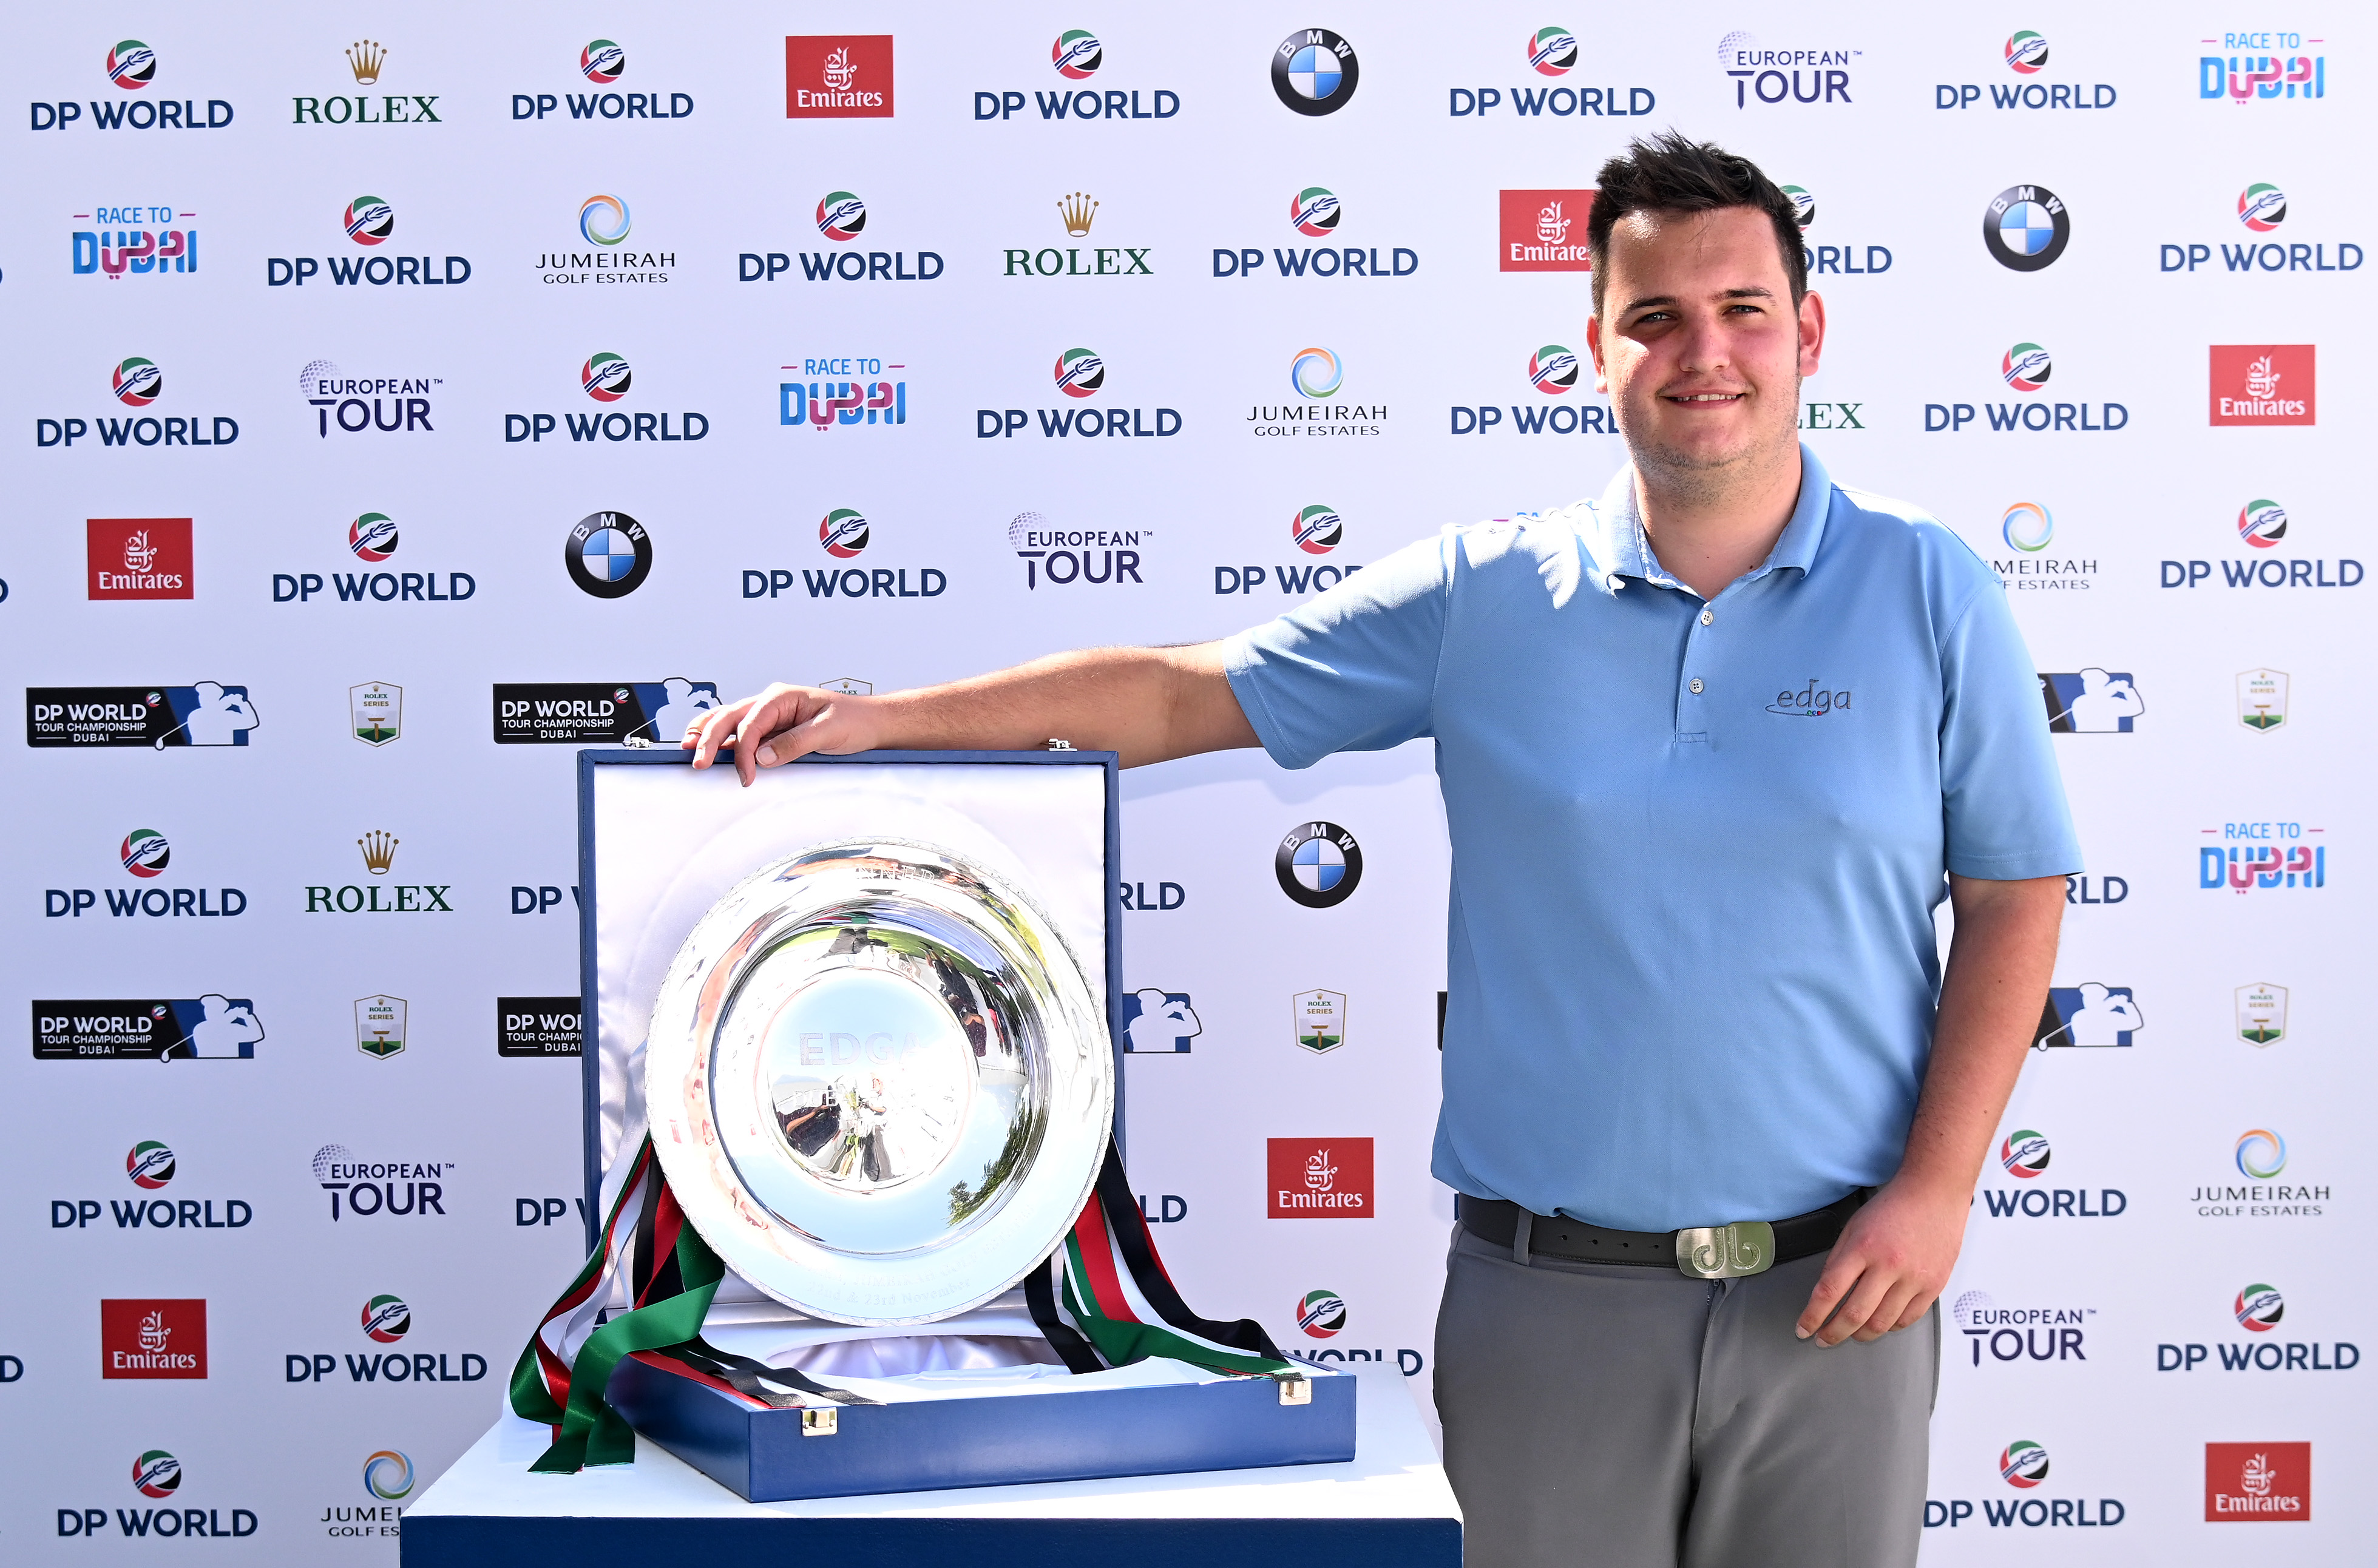 2019 EDGA champion George Groves